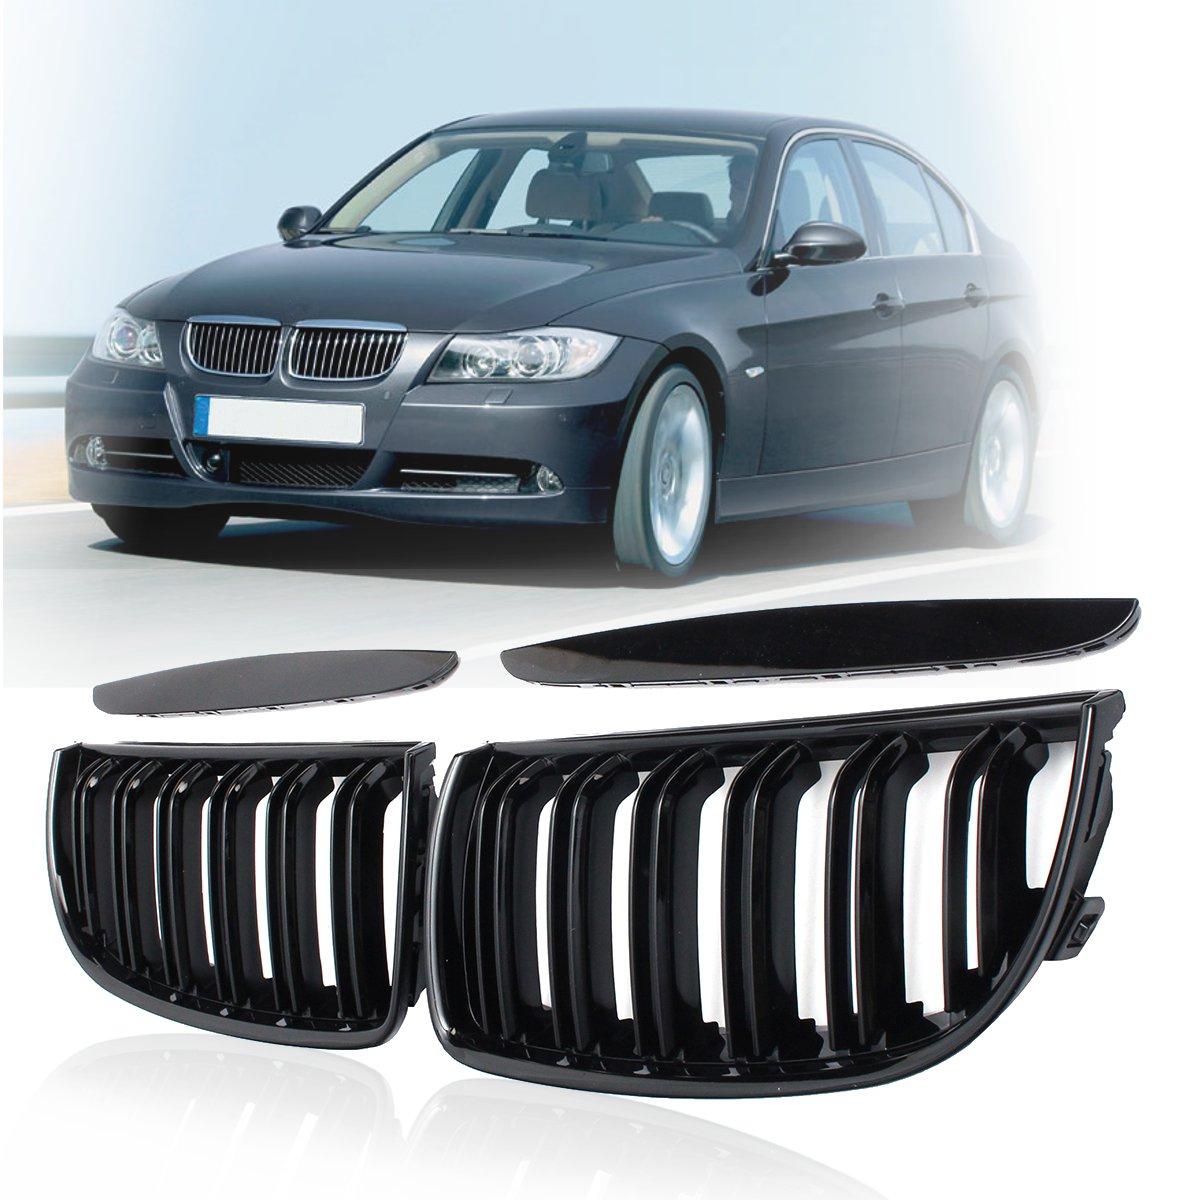 4 renk çift ön parlak mat karbon M renk siyah 2 satır çift Slat böbrek Grille Grill BMW E90 e91 4 kapı 2005 06 07 2008